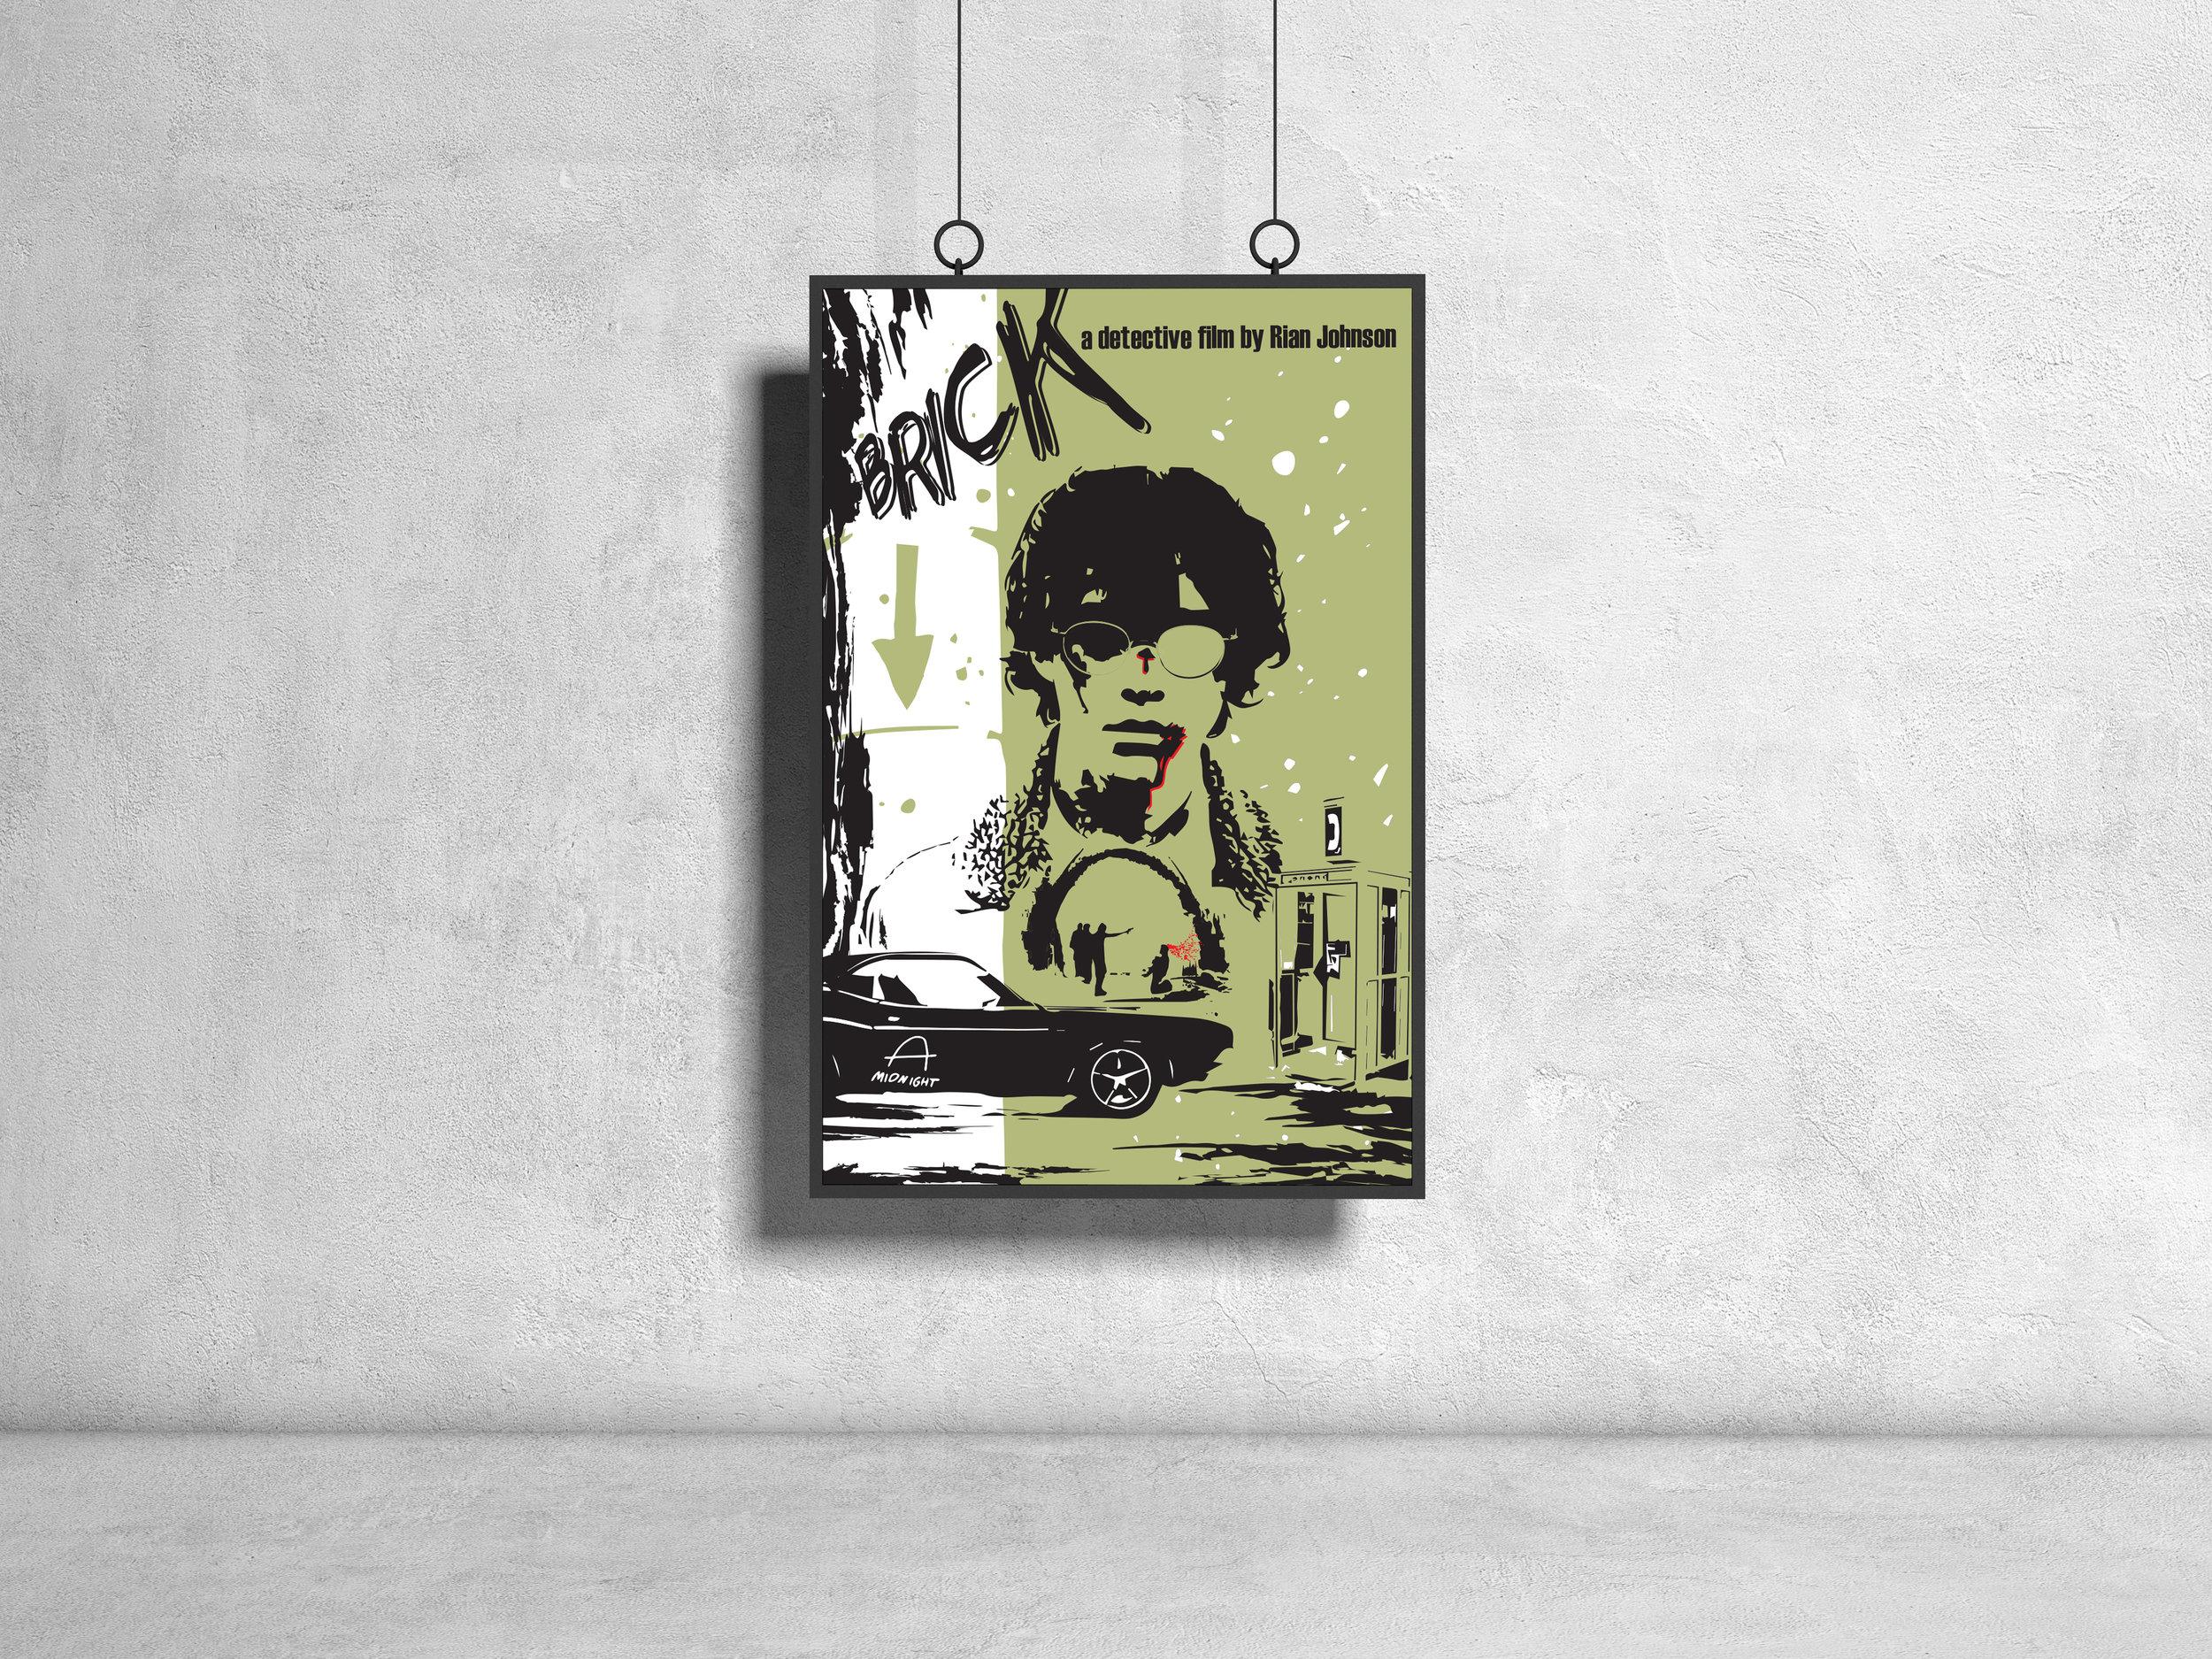 Poster for Rian Johnson's film Brick